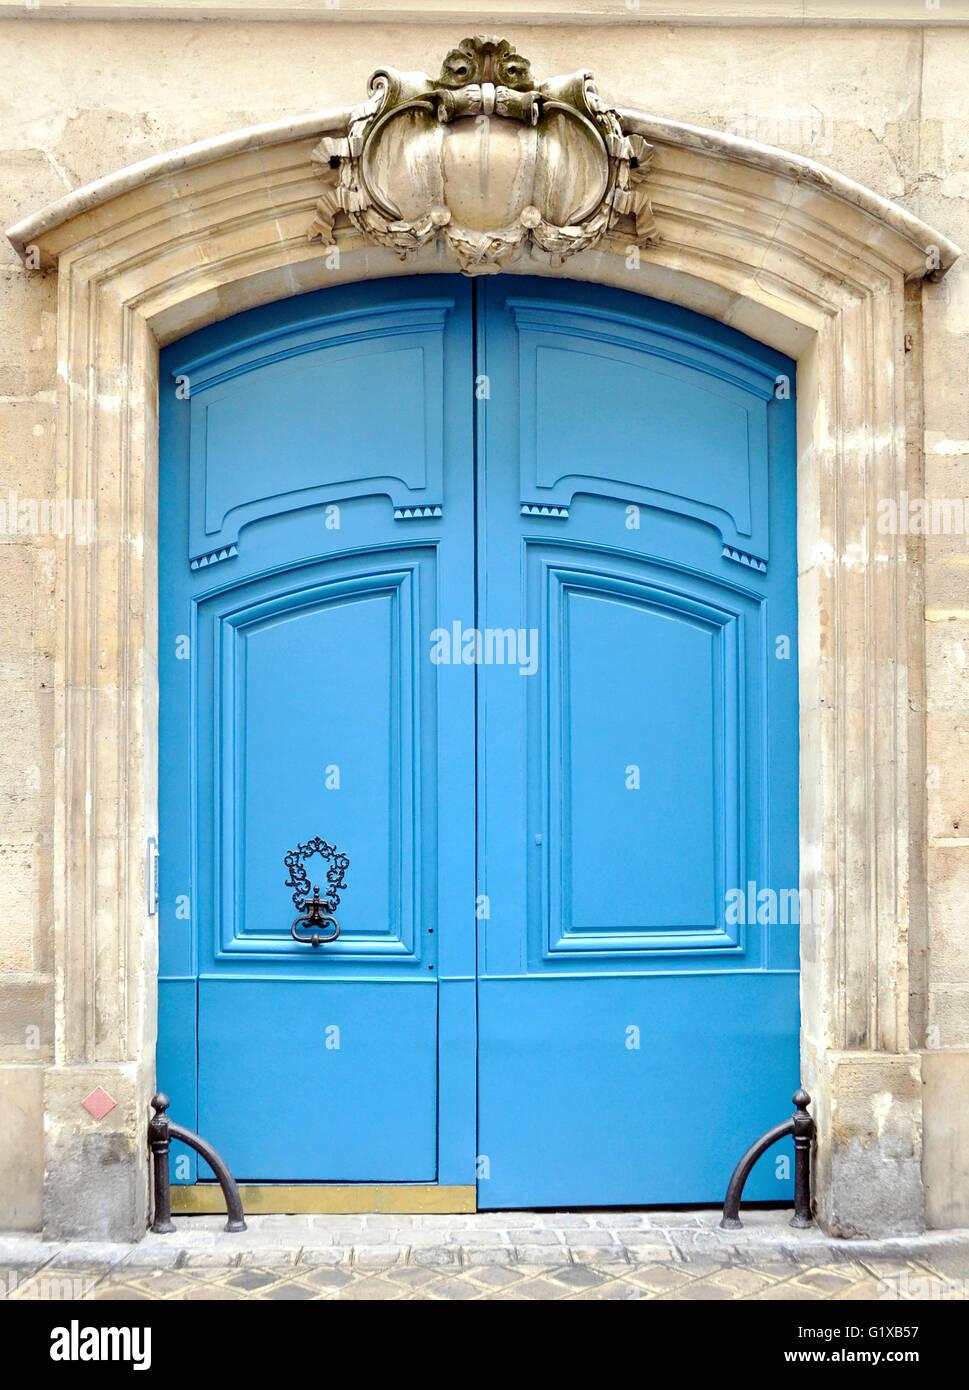 Una porta blu a Parigi, Francia Immagini Stock